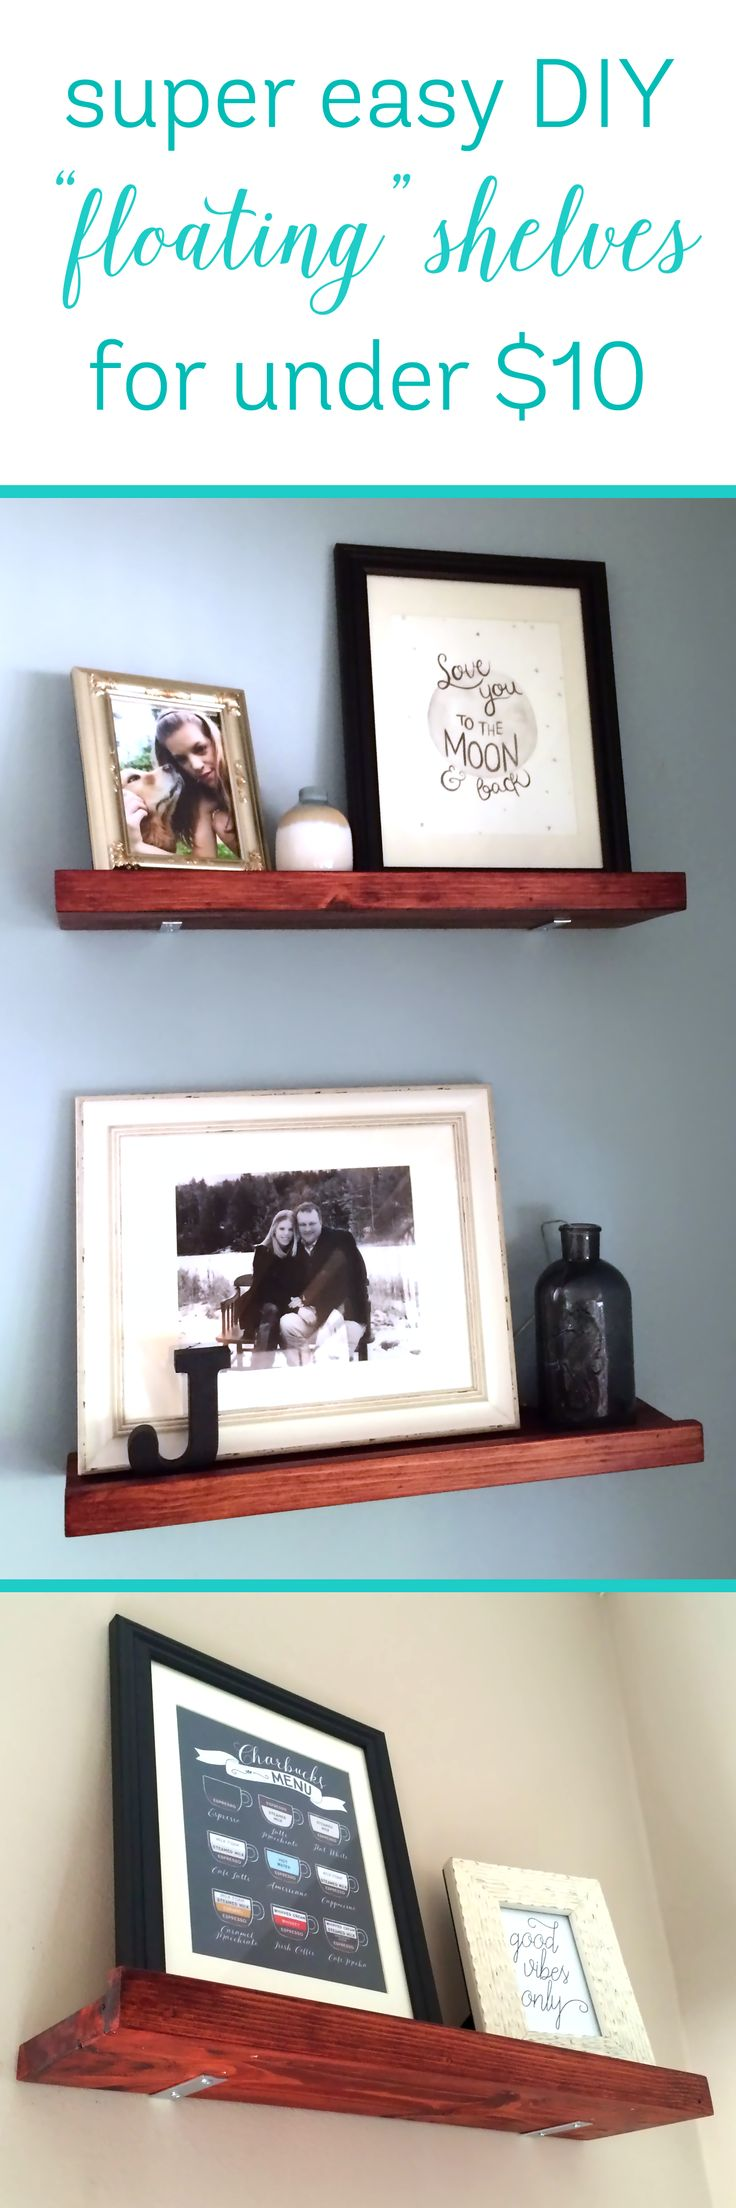 DIY Faux Floating Shelves for Under $10 a Shelf! | Riss Home Design | Home Decor, Design and DIY Blog